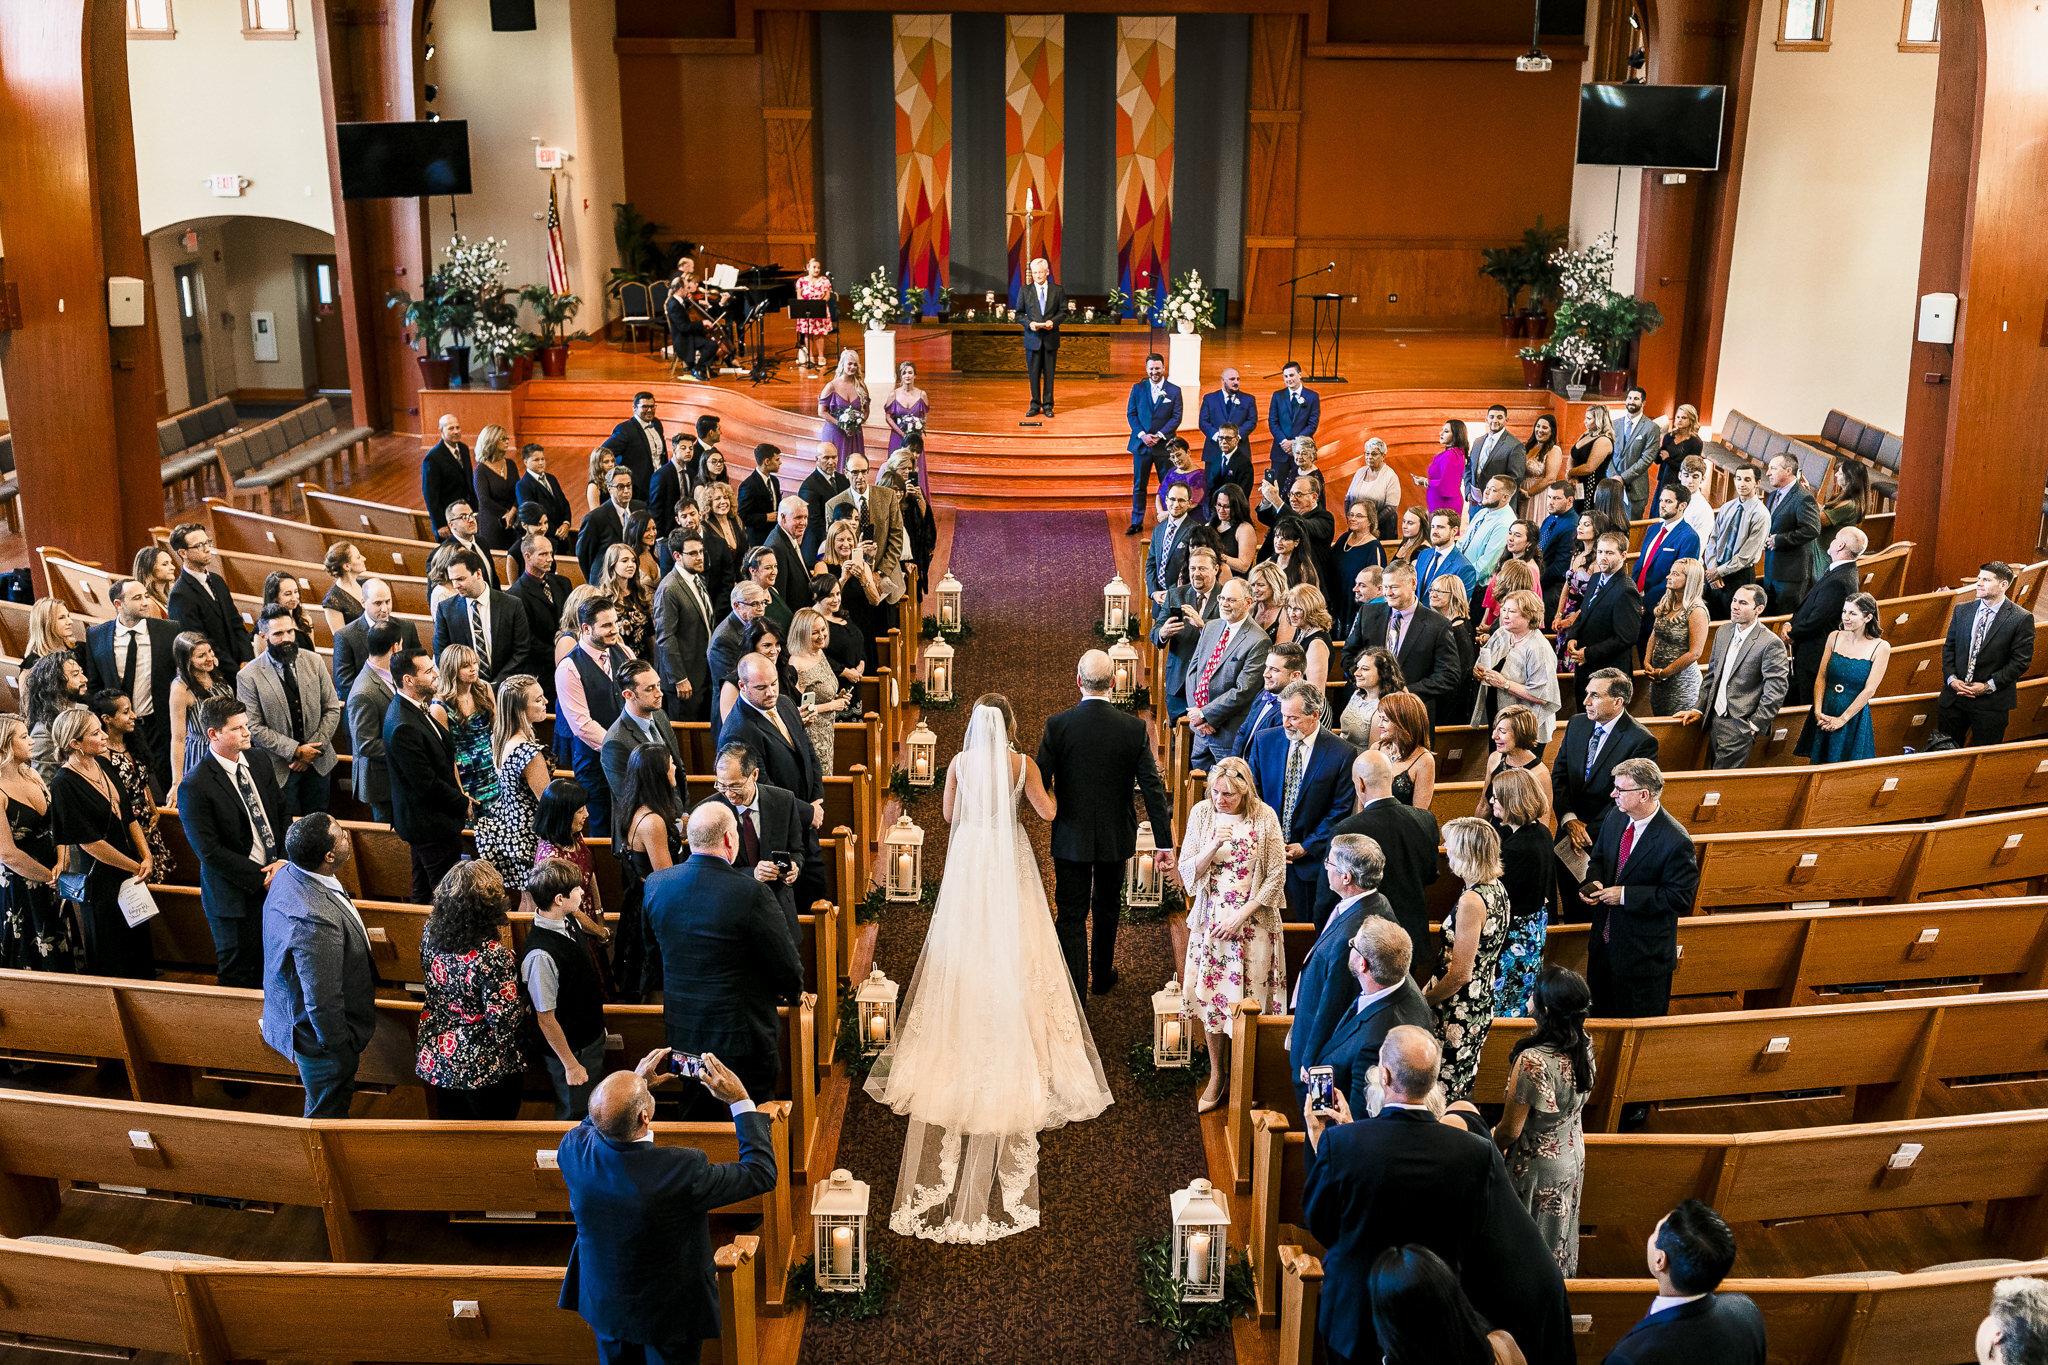 Coyle-Forsgate-Country-Club-Wedding-Photographer-09.JPG